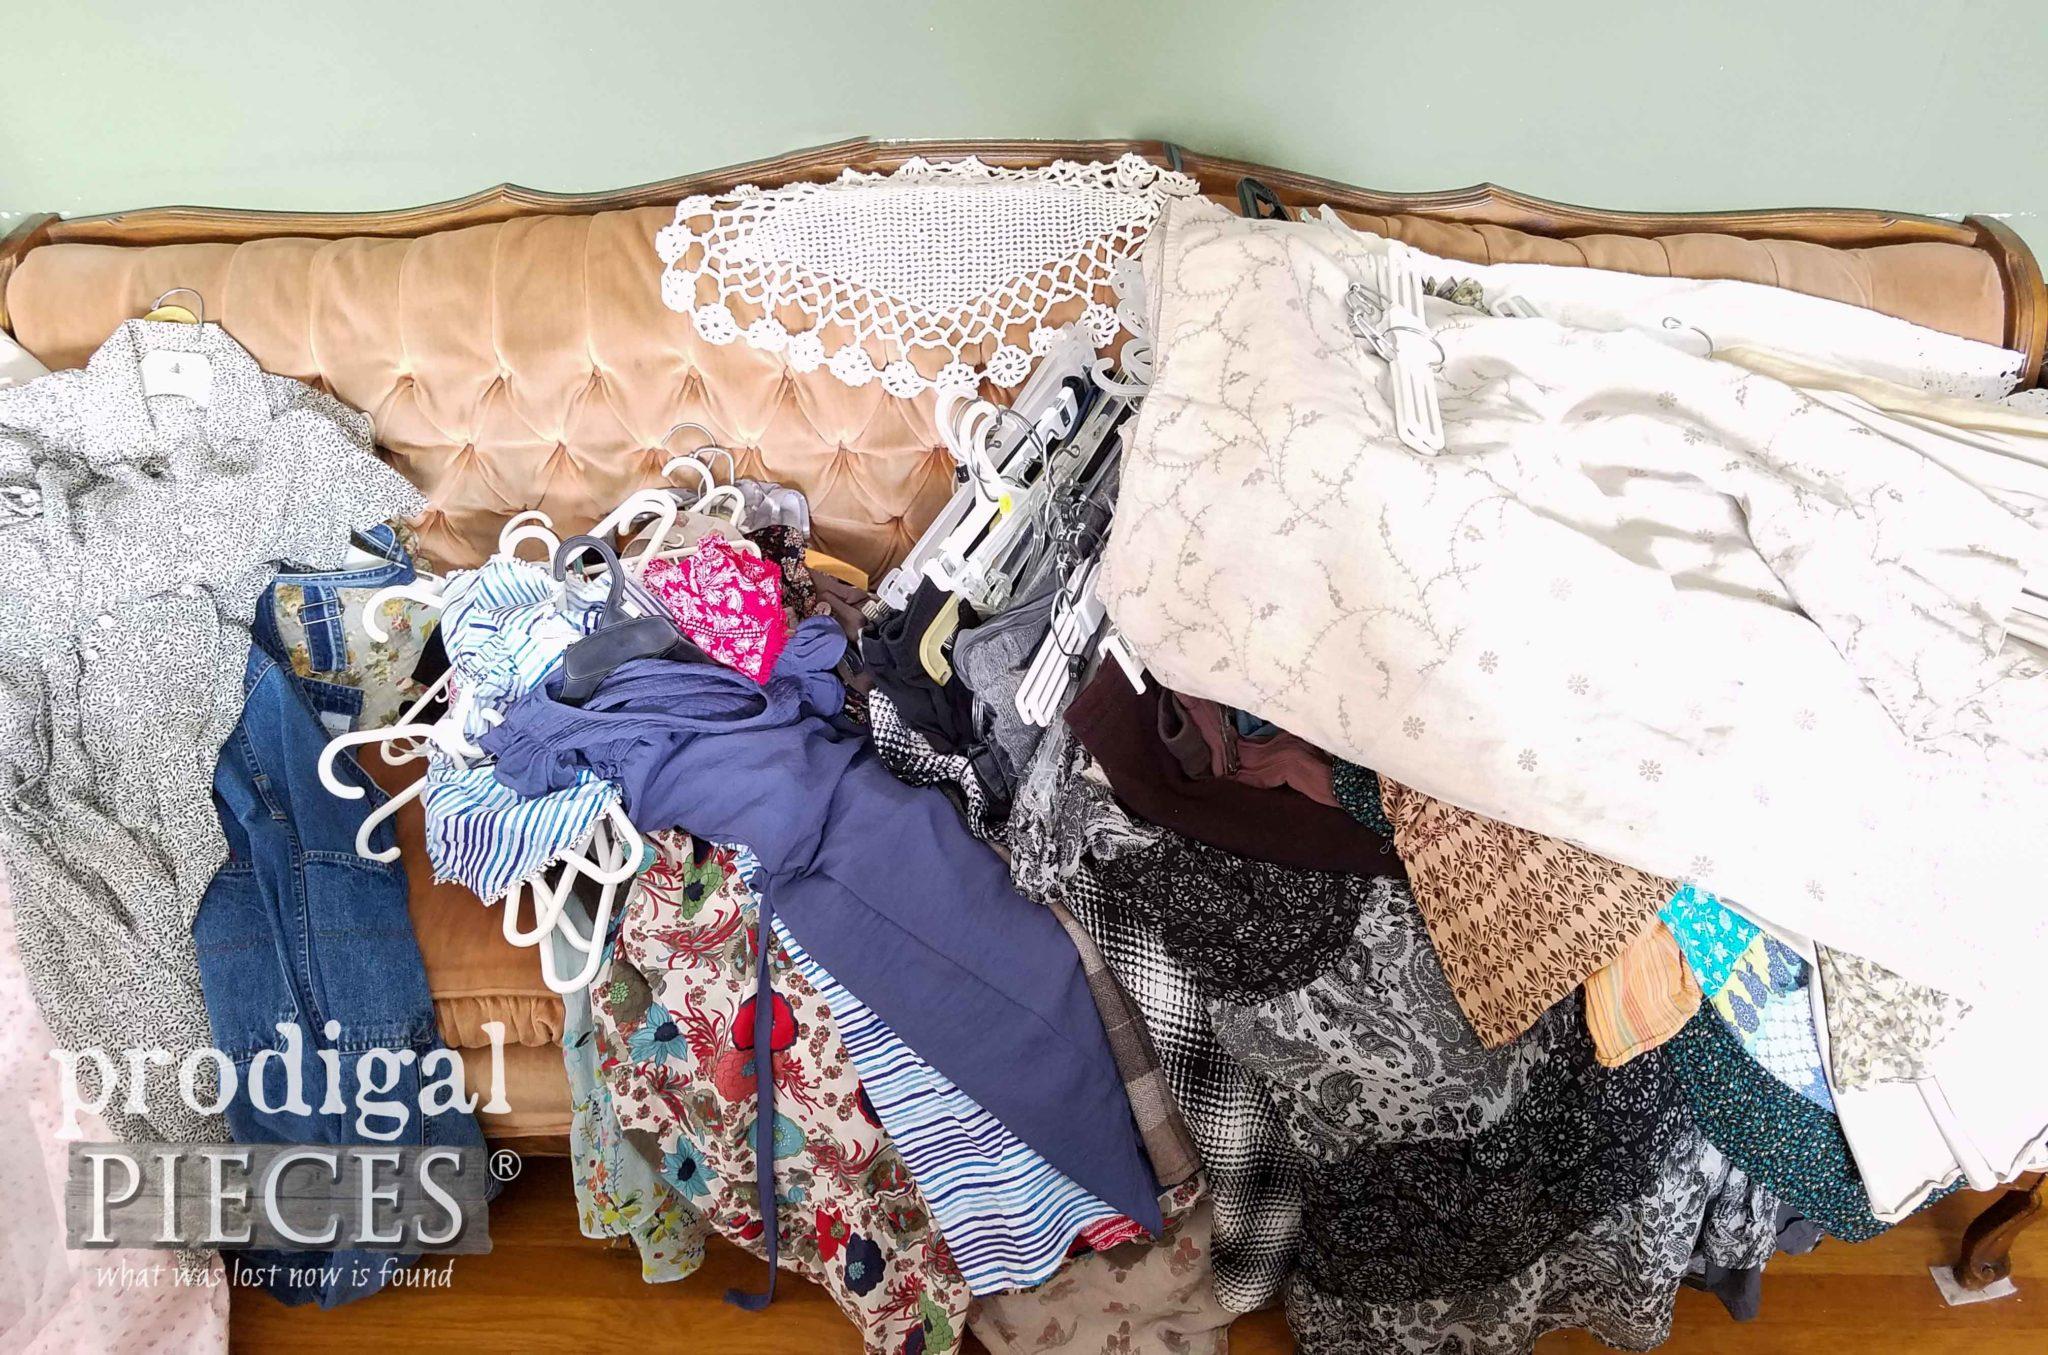 Hot Mess of Clothes...hahaha...  prodigalpieces.com